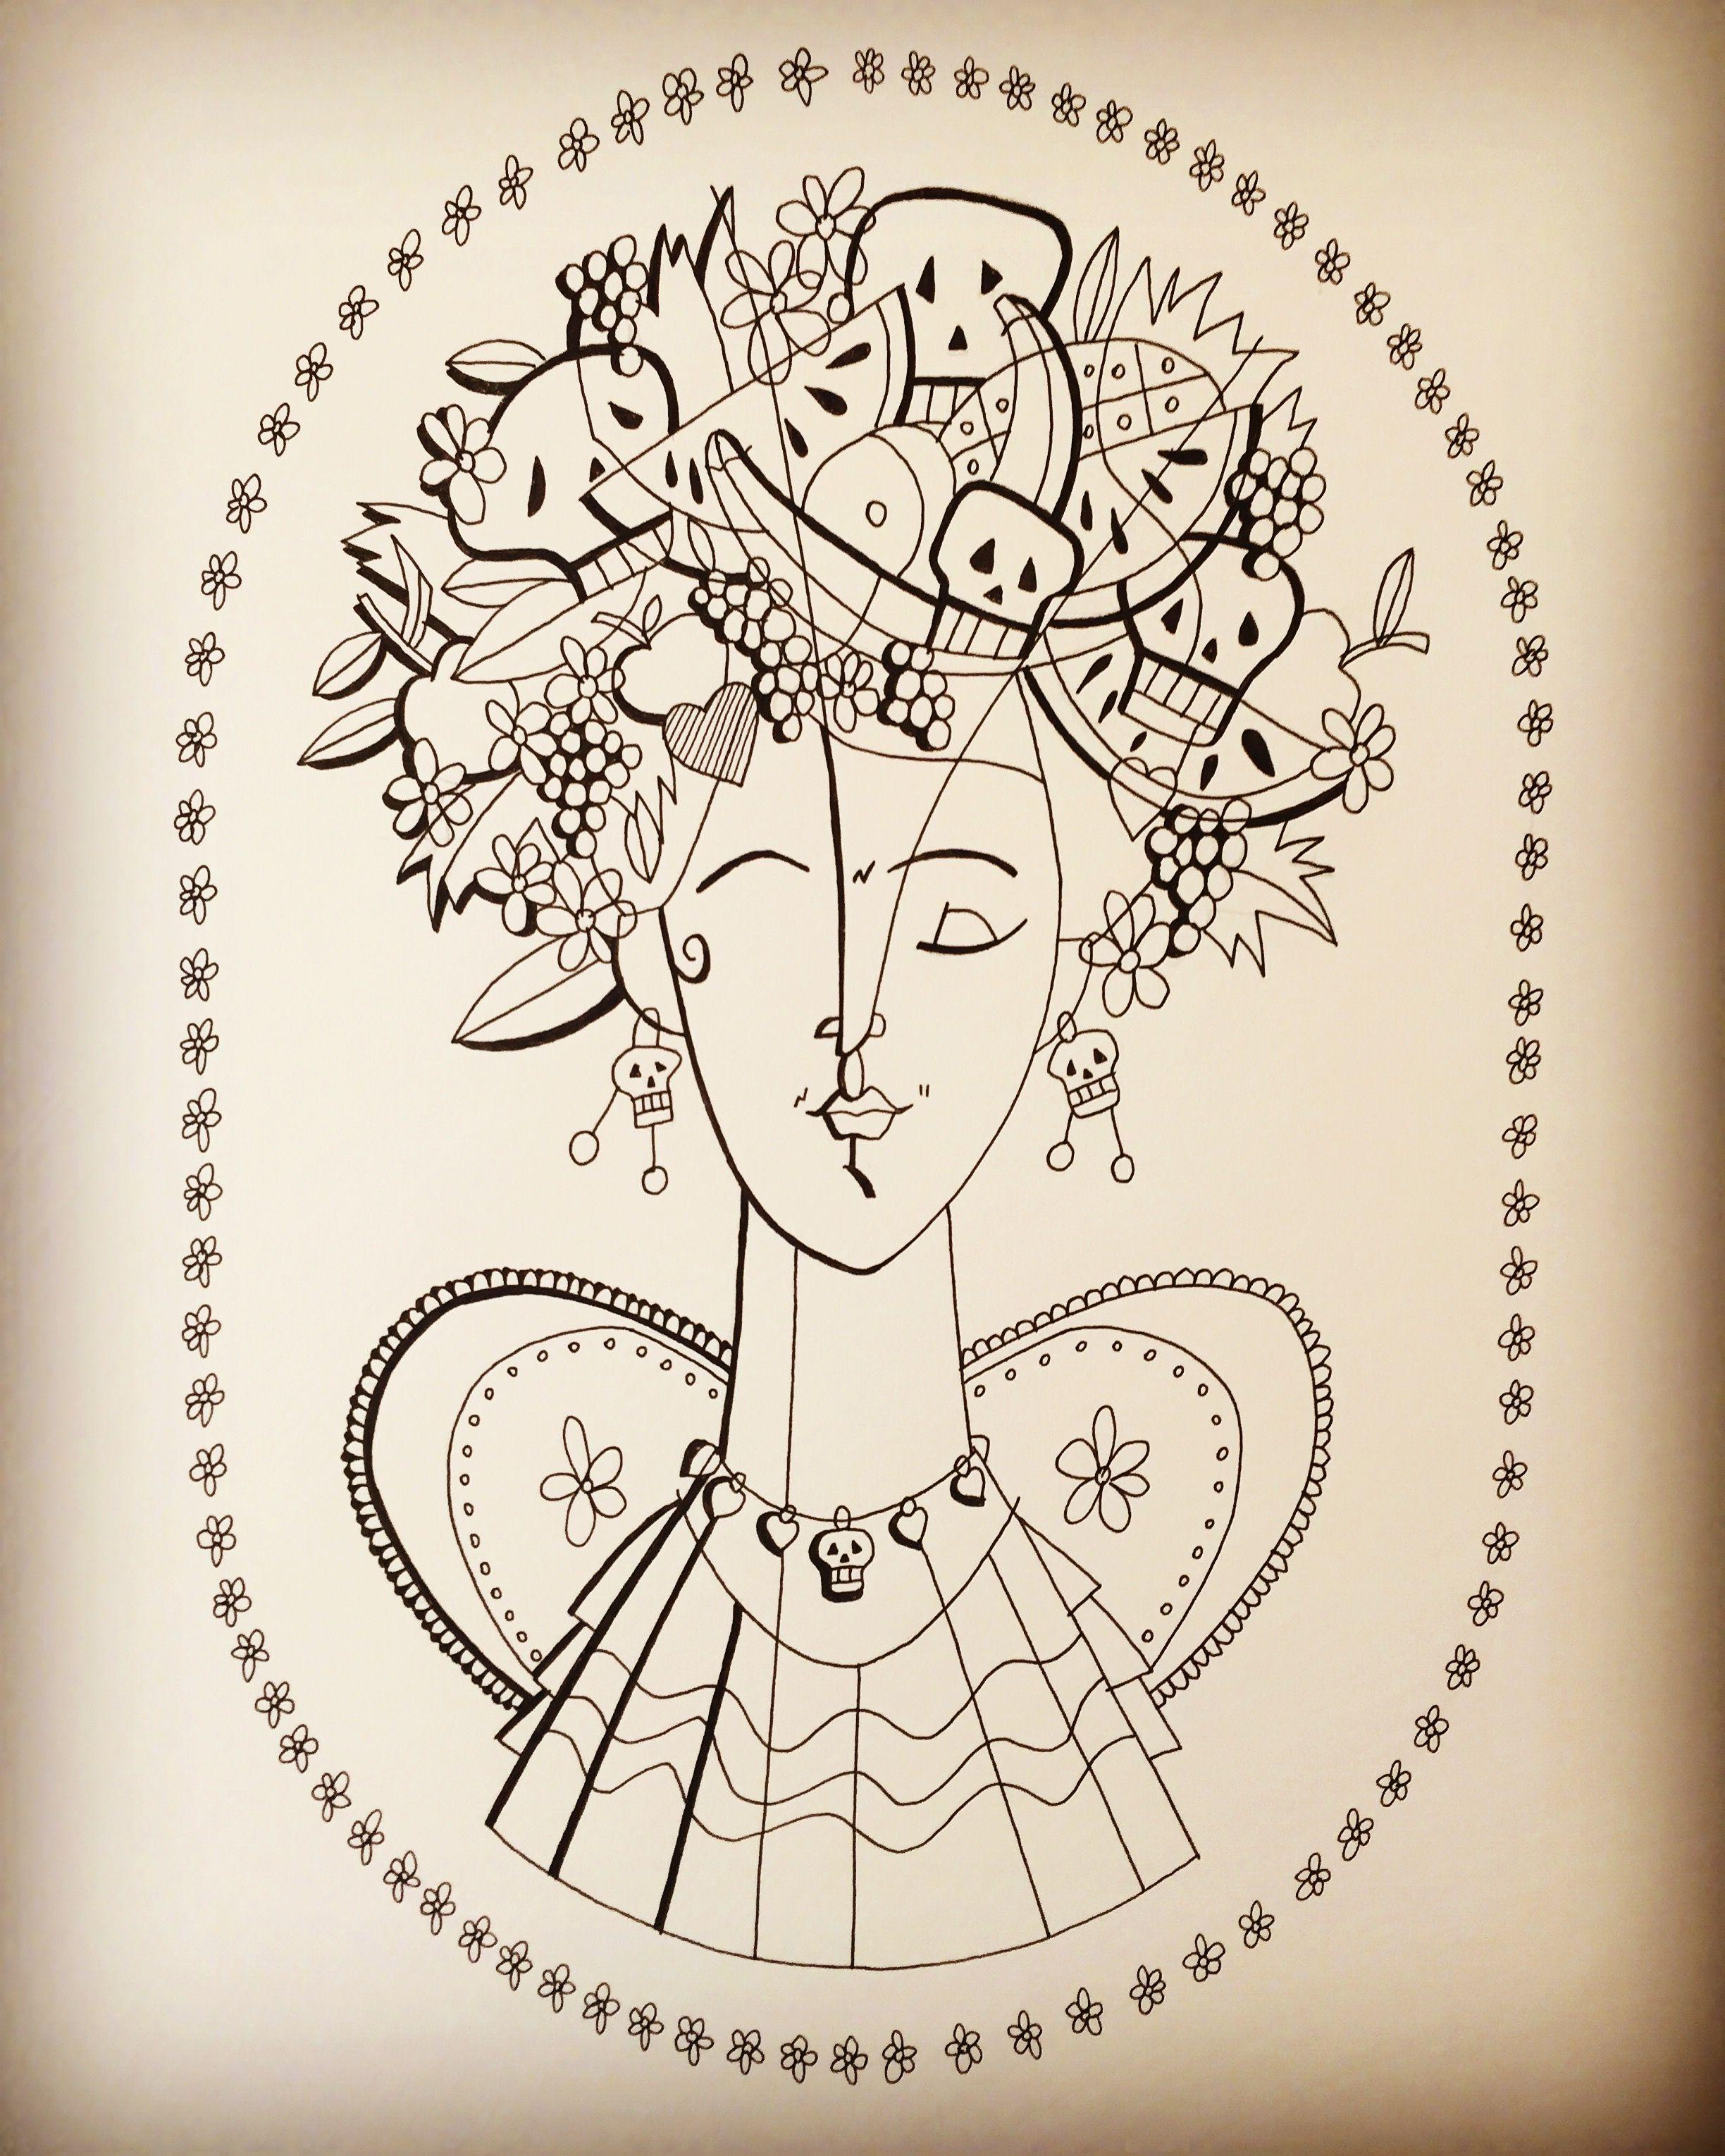 Pin by Diego Cousillas Delgado on Frida Kahlo by Diego Cousillas ...